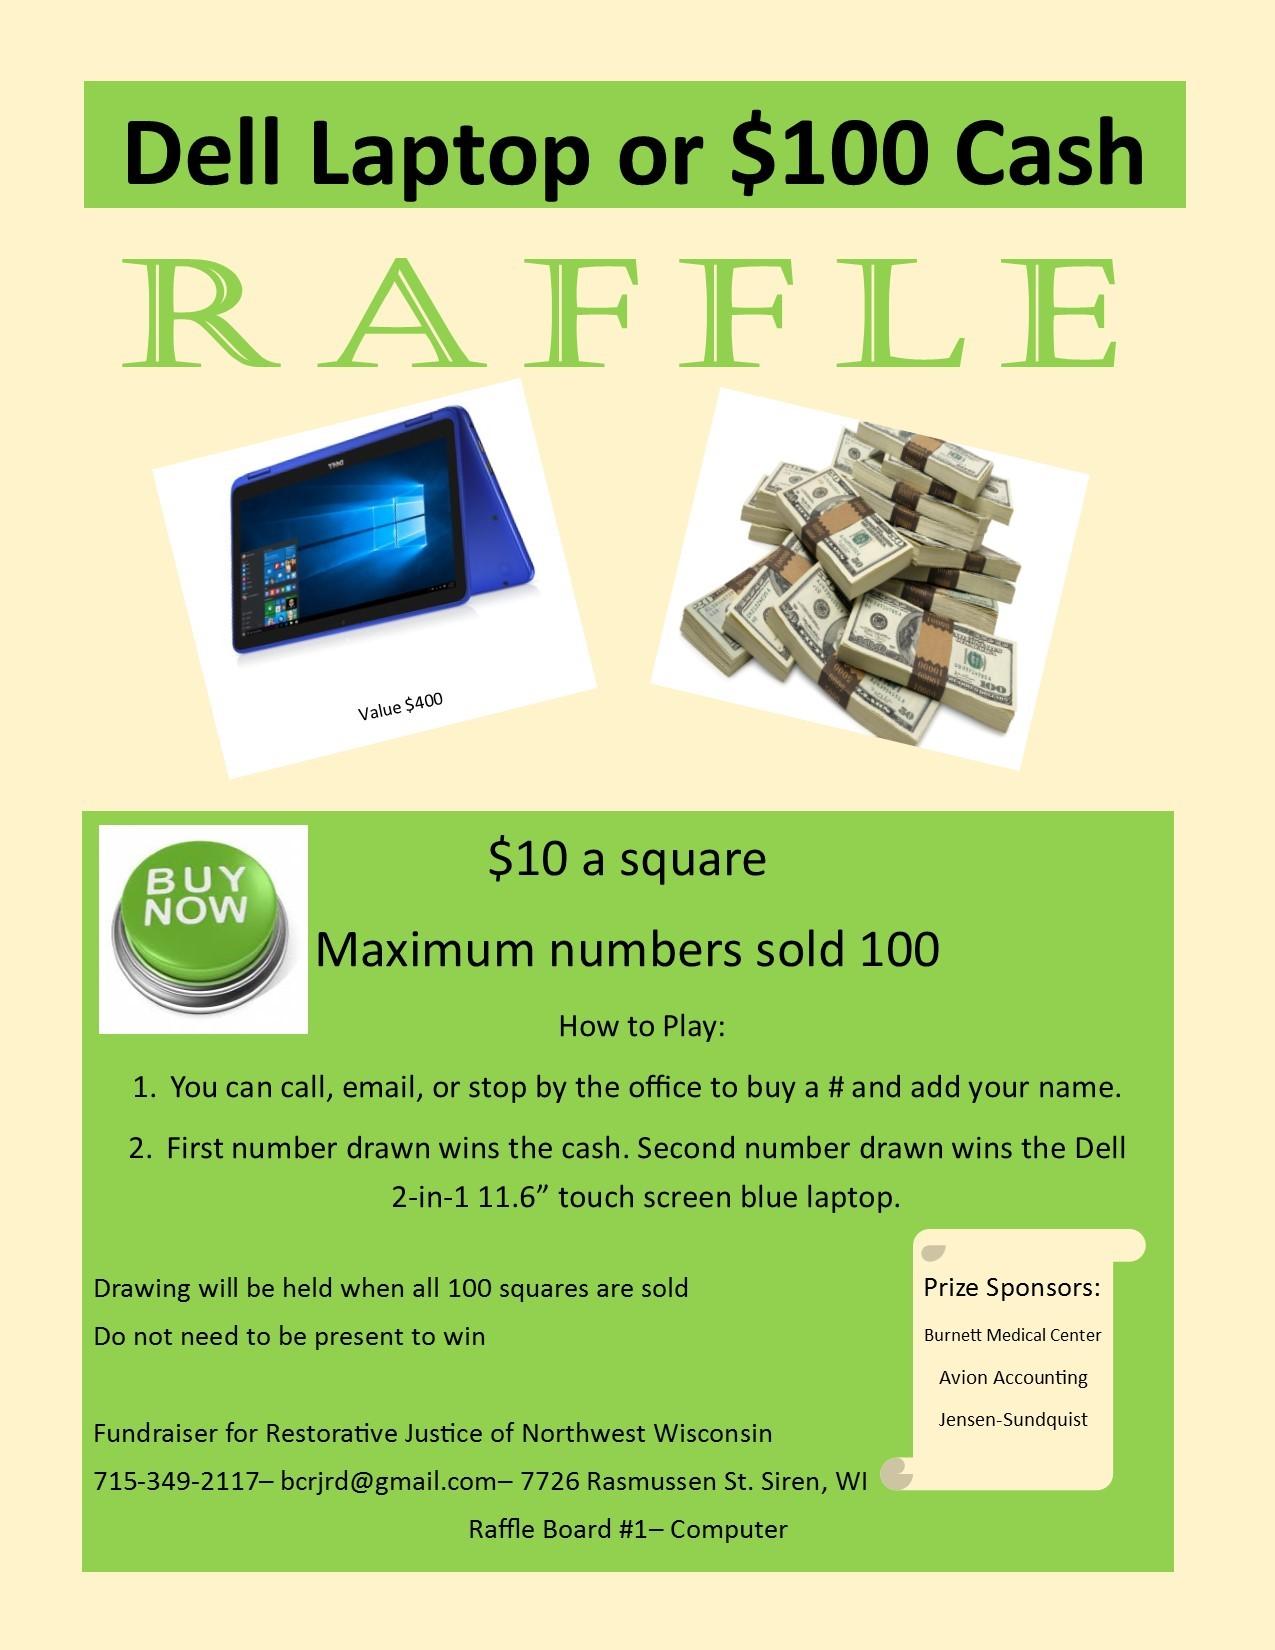 Raffle-Board-Fundraiser